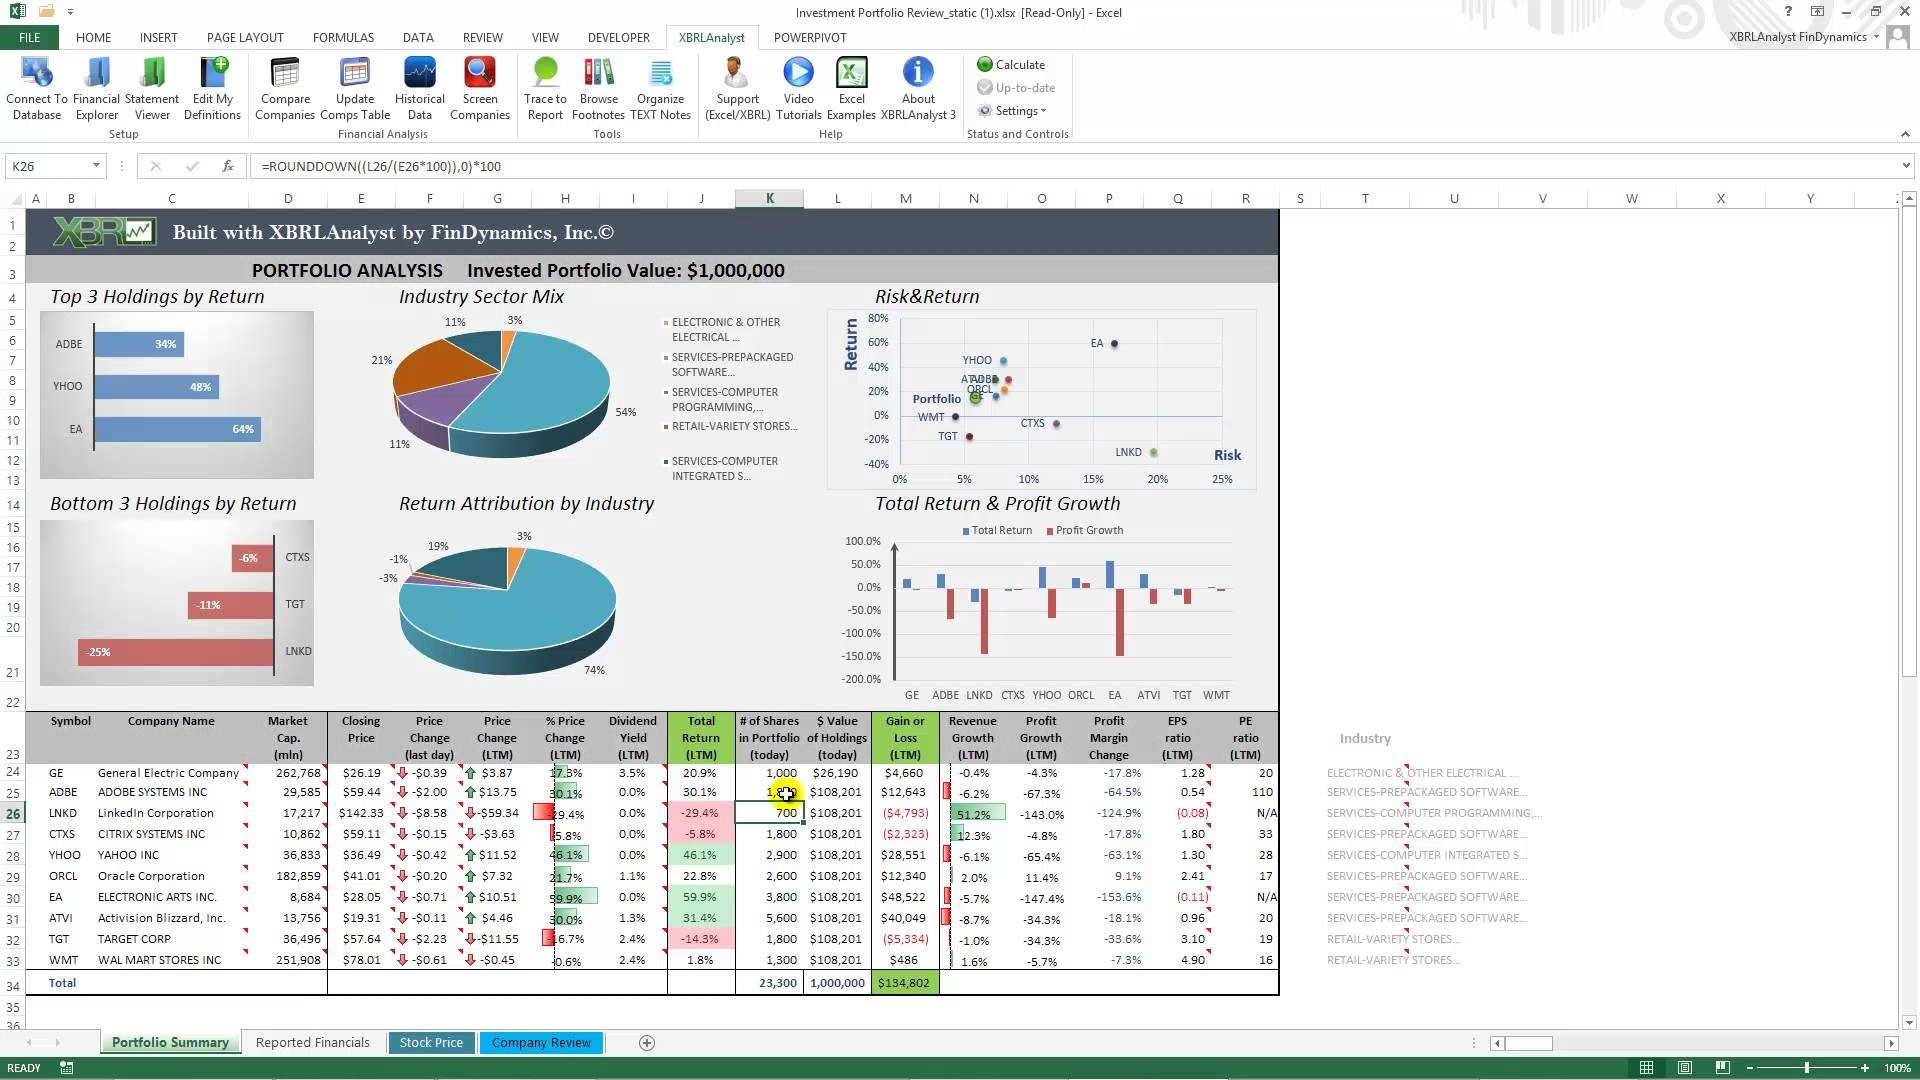 Stock Analysis Spreadsheet Excel Template For Sample Growth Stock Portfolio Inspirationa Stock Analysis